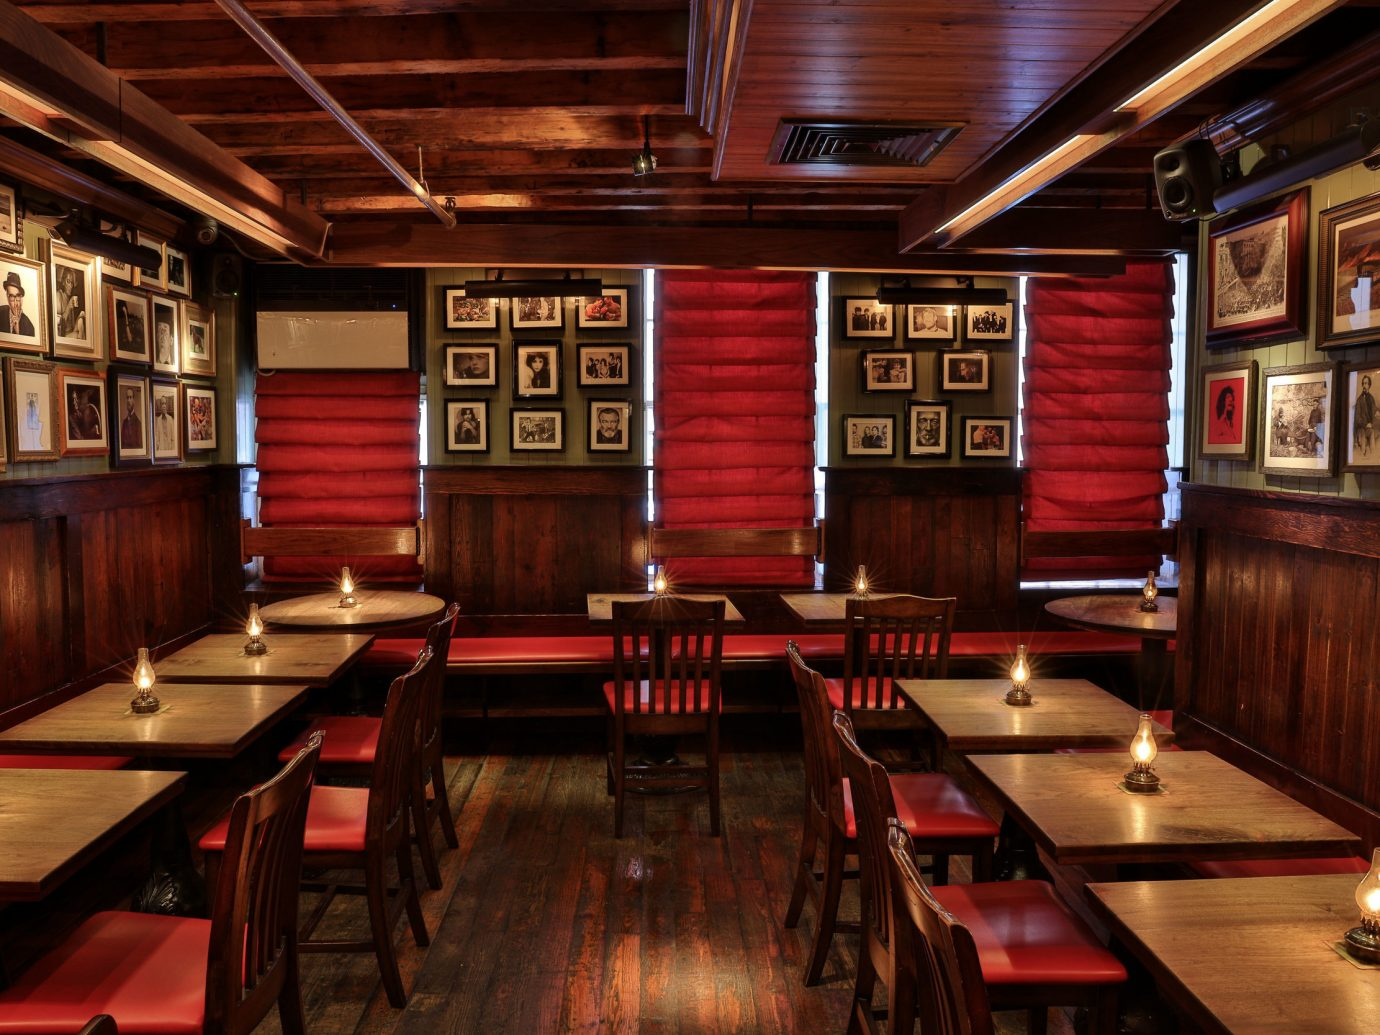 Food + Drink indoor floor table ceiling room interior design restaurant Bar tavern pub café shelf wood furniture dining room